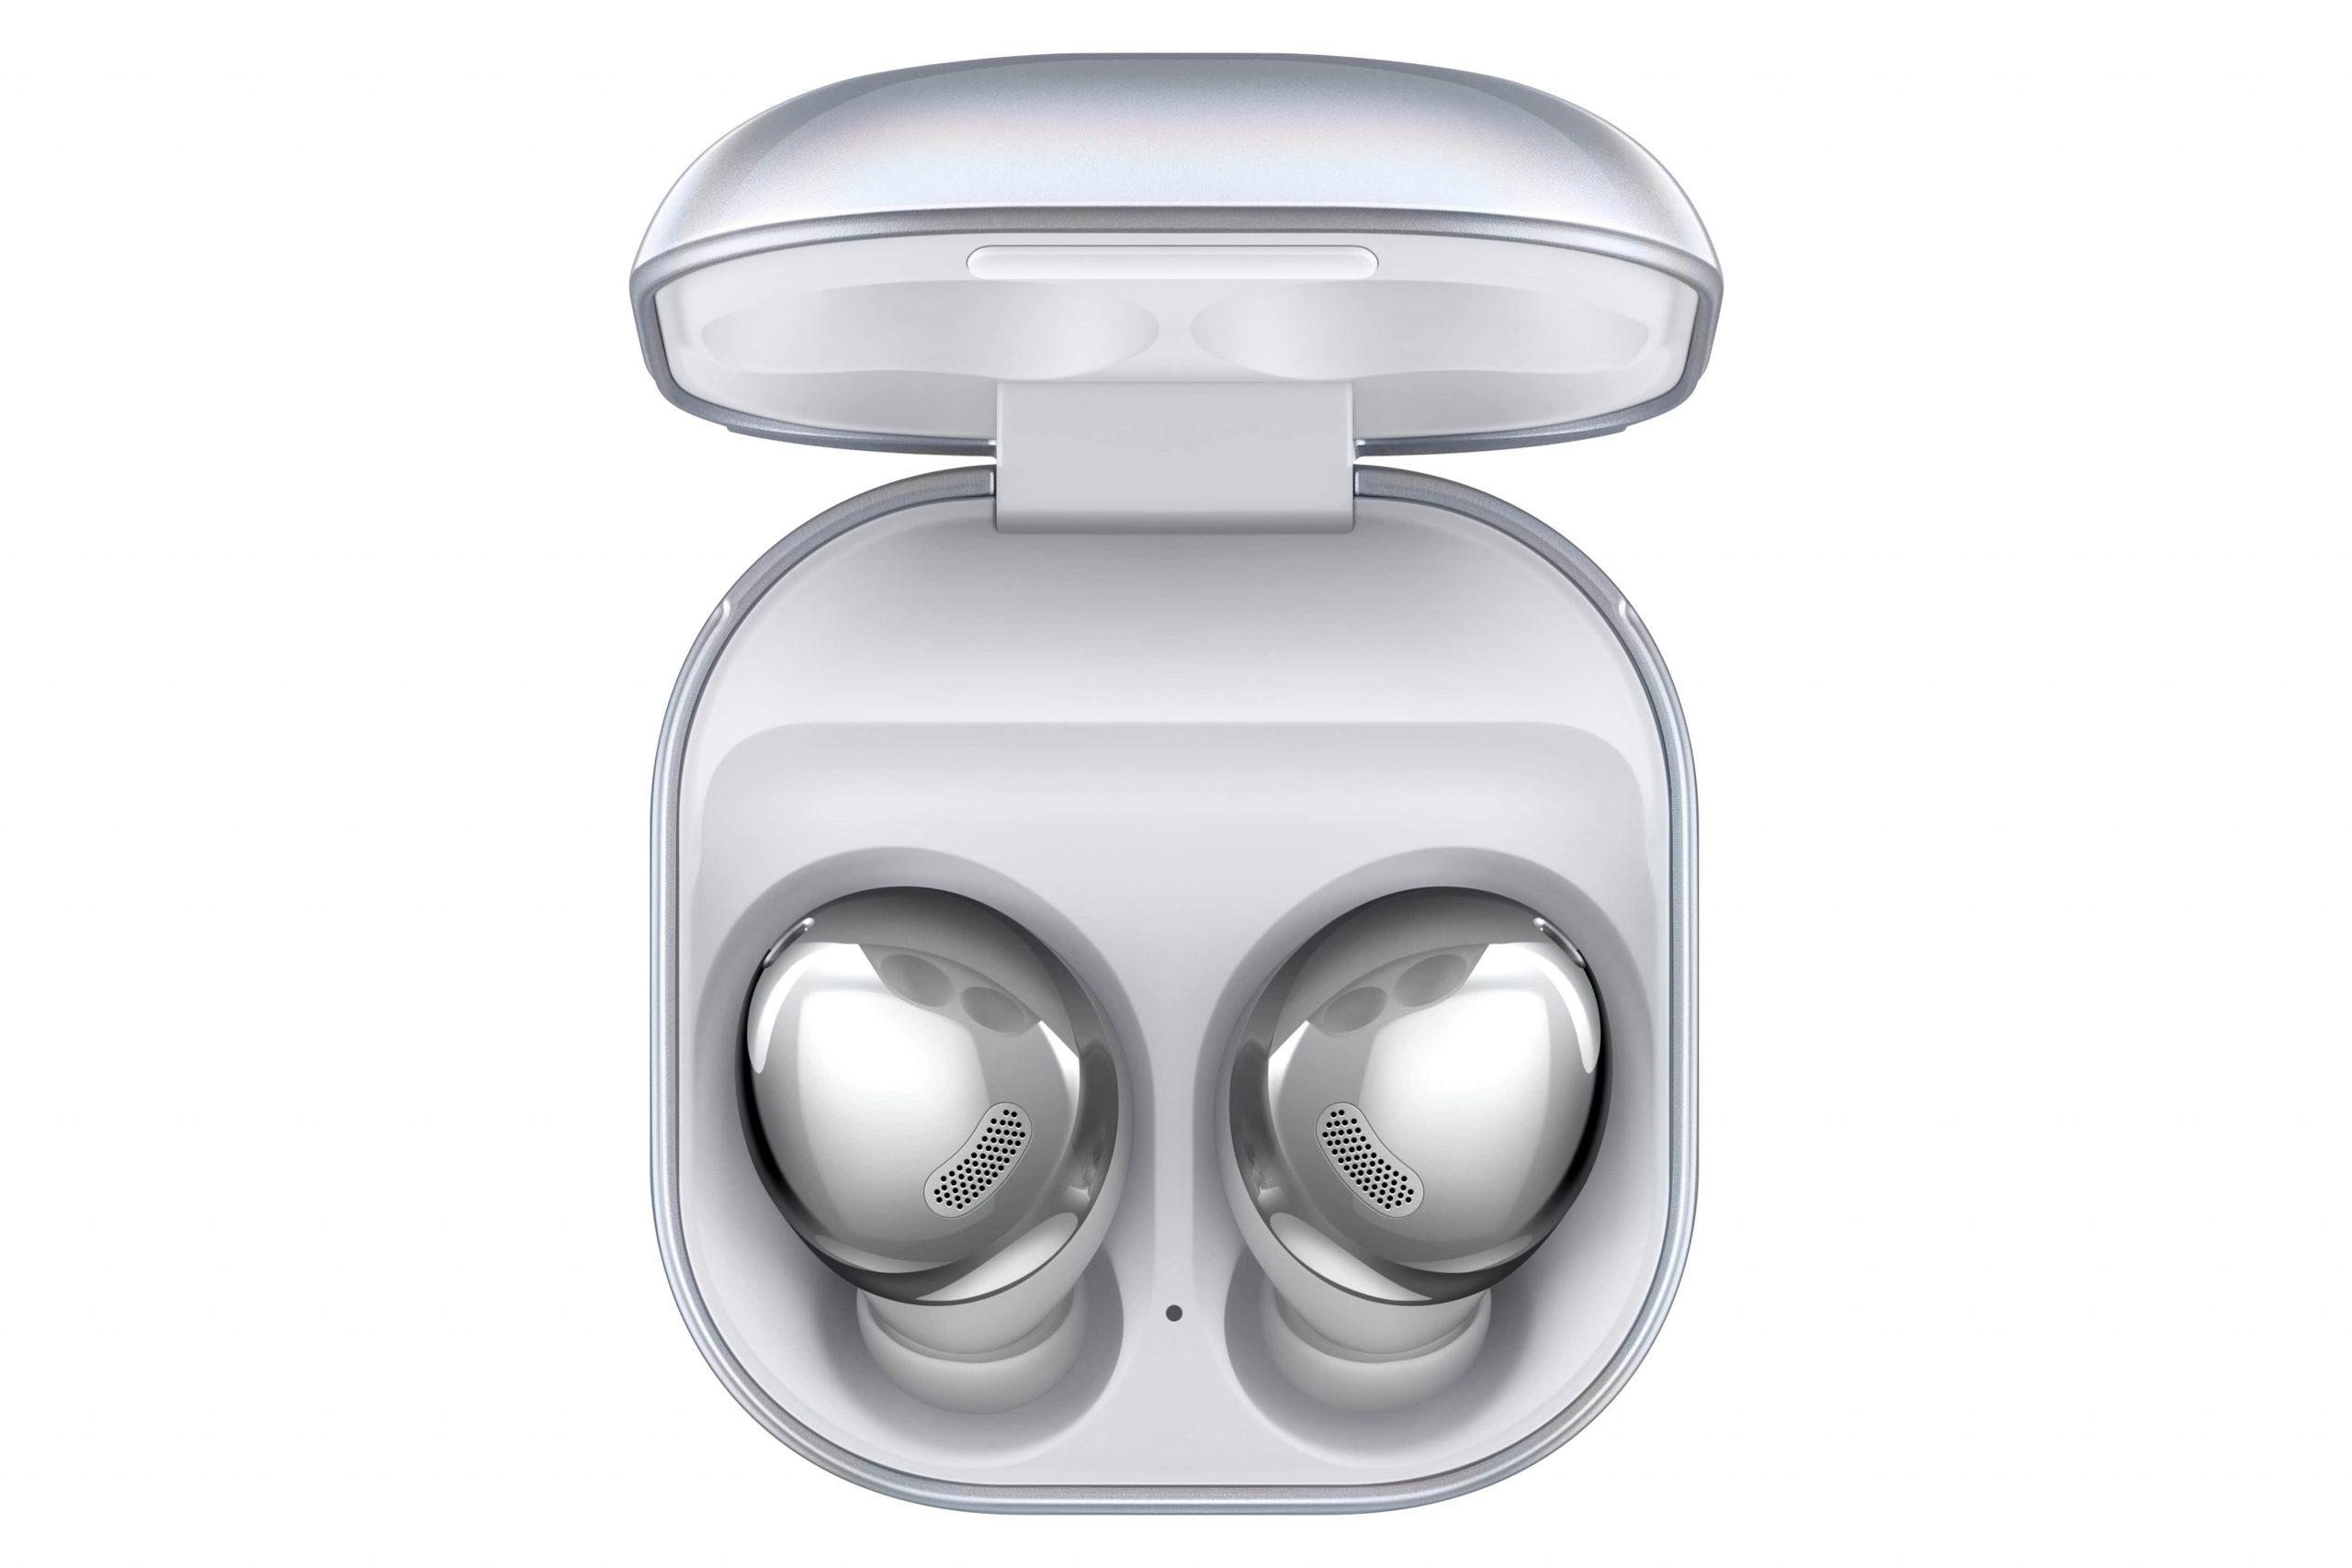 Samsung Galaxy Buds Pro Phantom Silver Top, Samsung True Wireless Earbuds Singapore